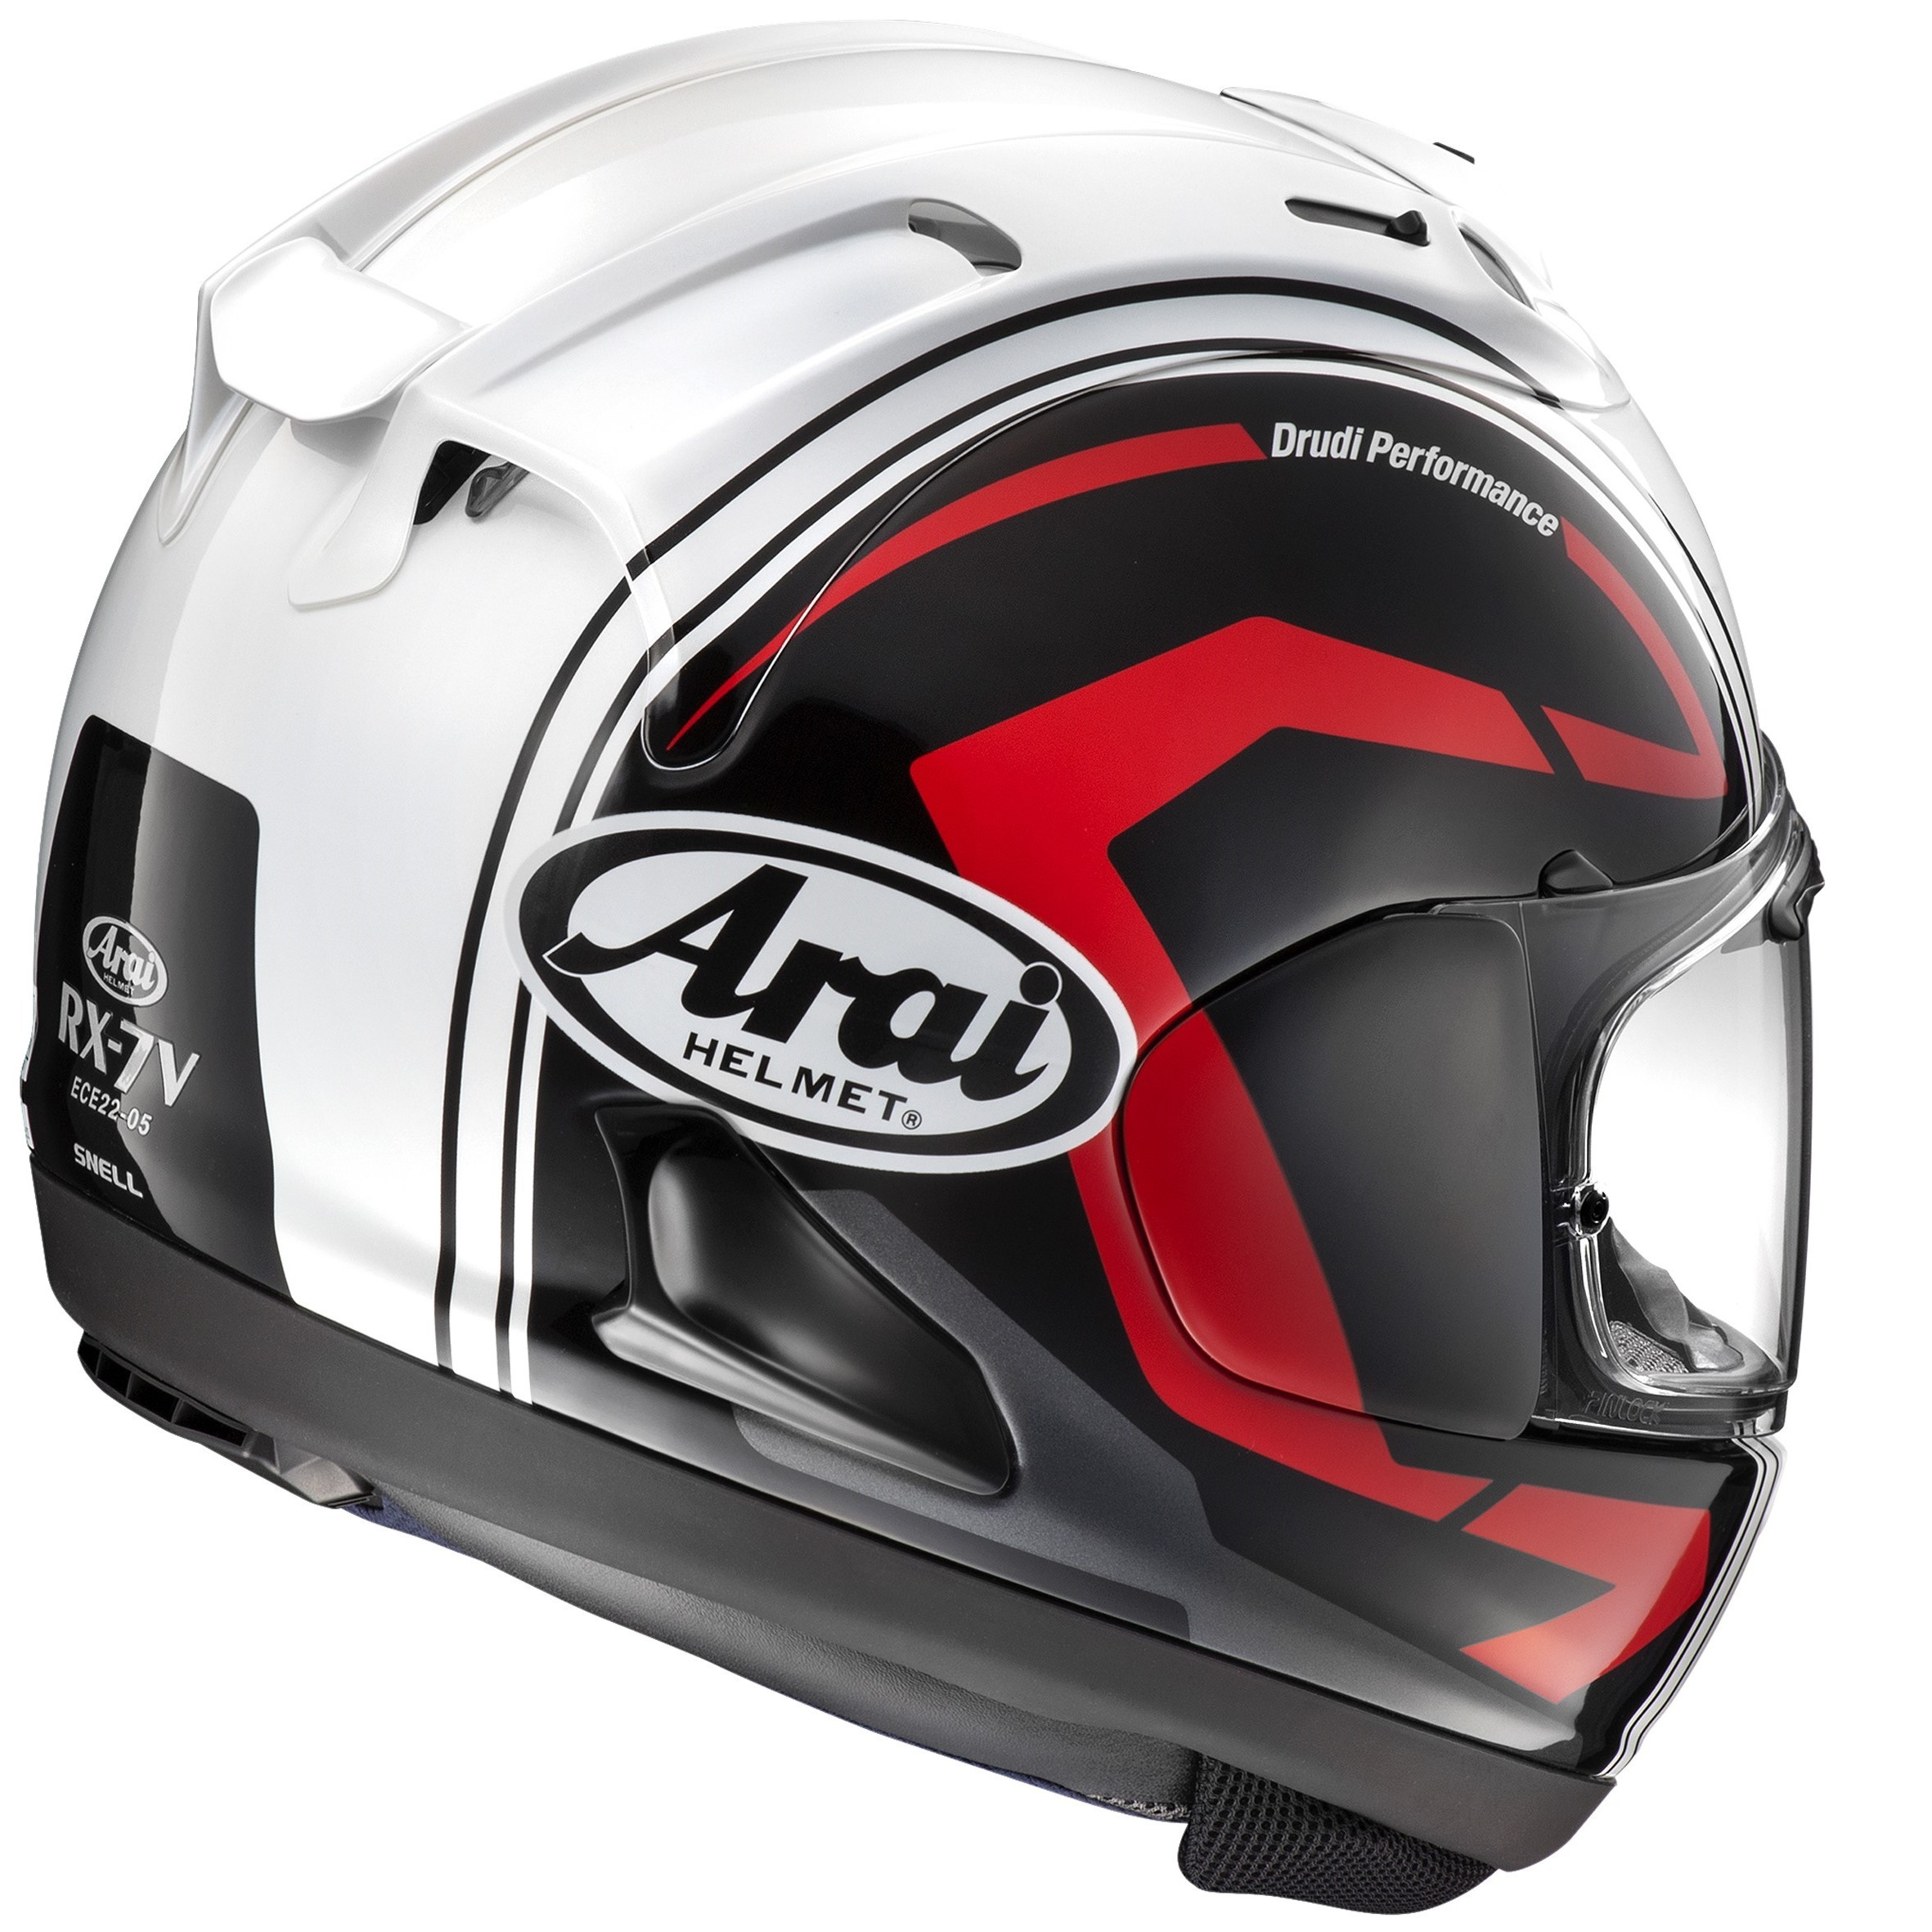 arai rx 7v statement full face helmet. Black Bedroom Furniture Sets. Home Design Ideas